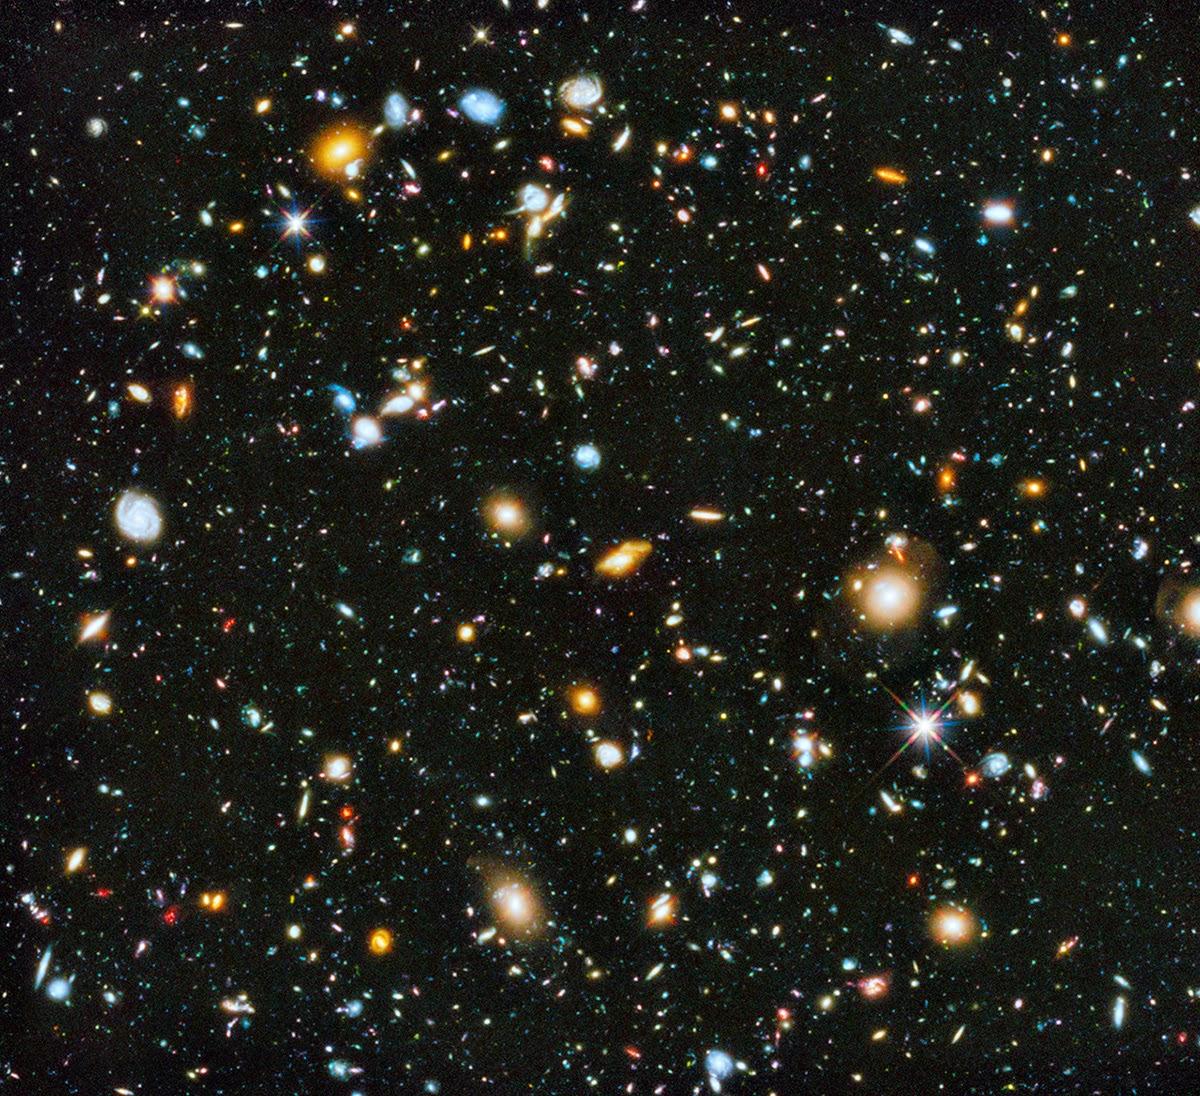 [Jeu] Association d'images - Page 4 Hubblebellissima